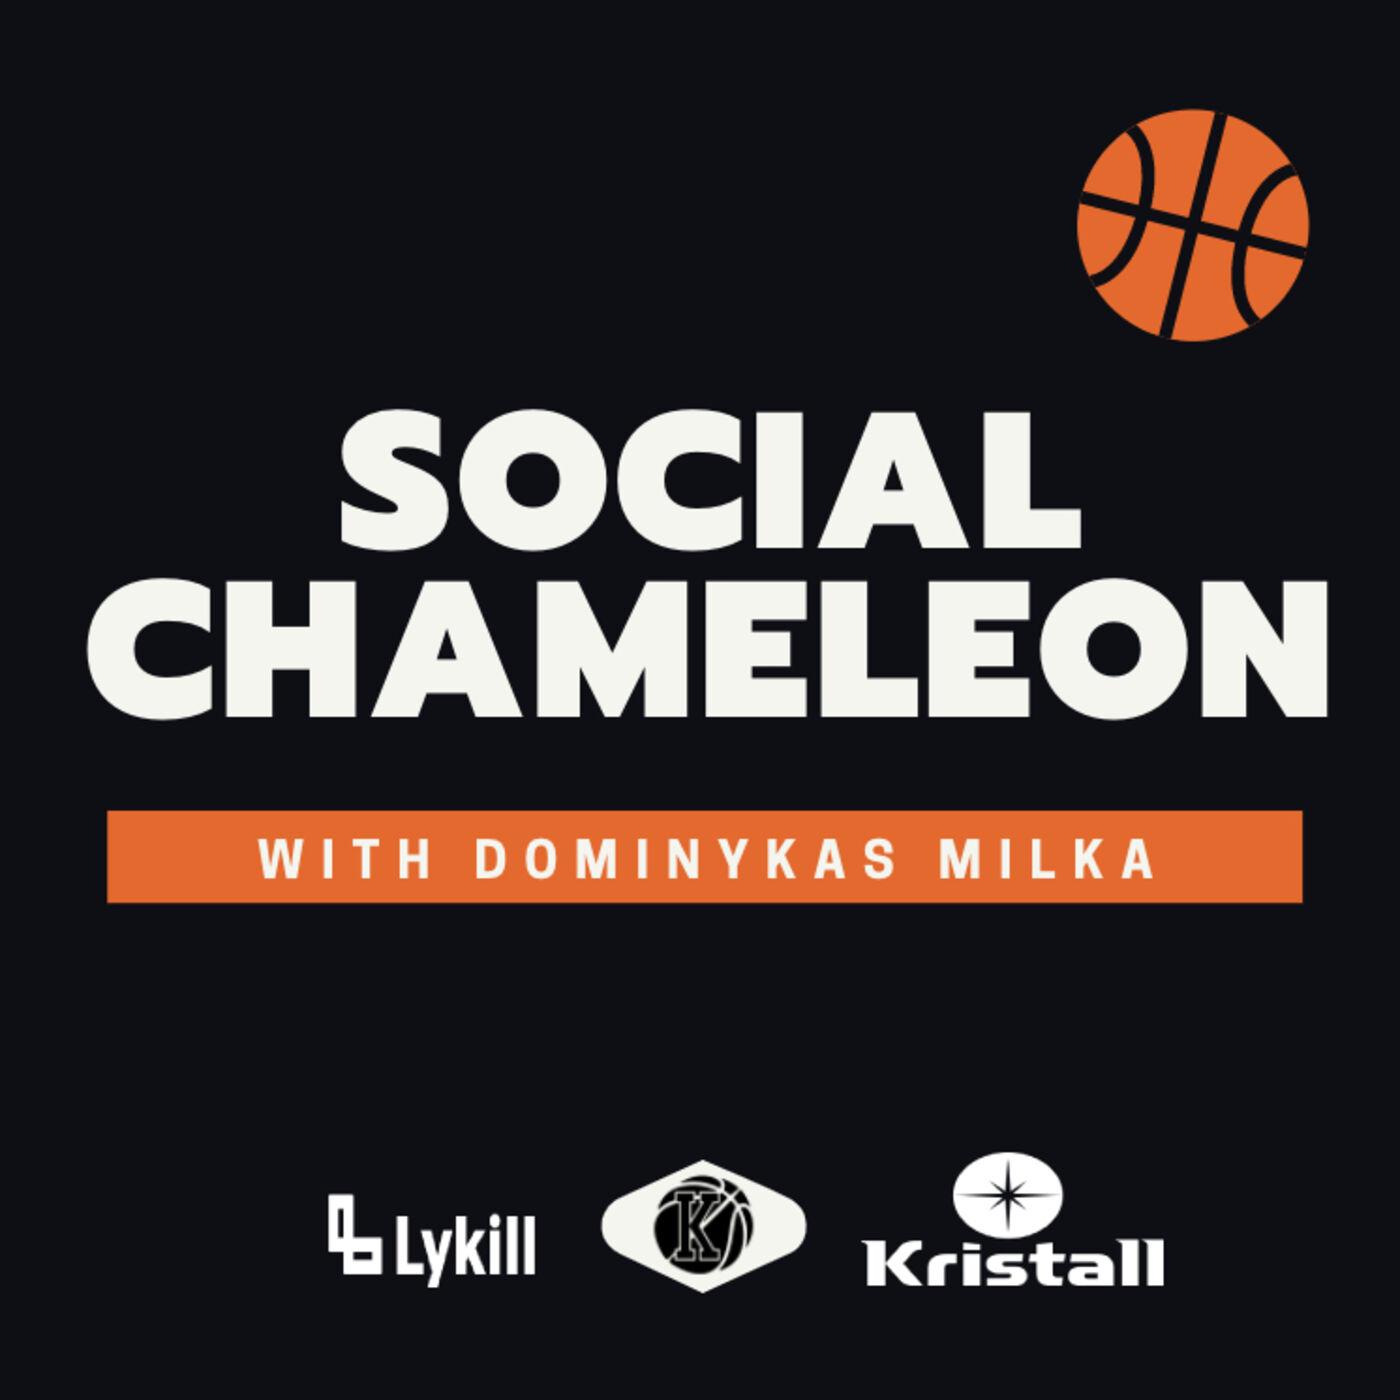 Social Chameleon #3- Coaching and development with Gústi Björgvins